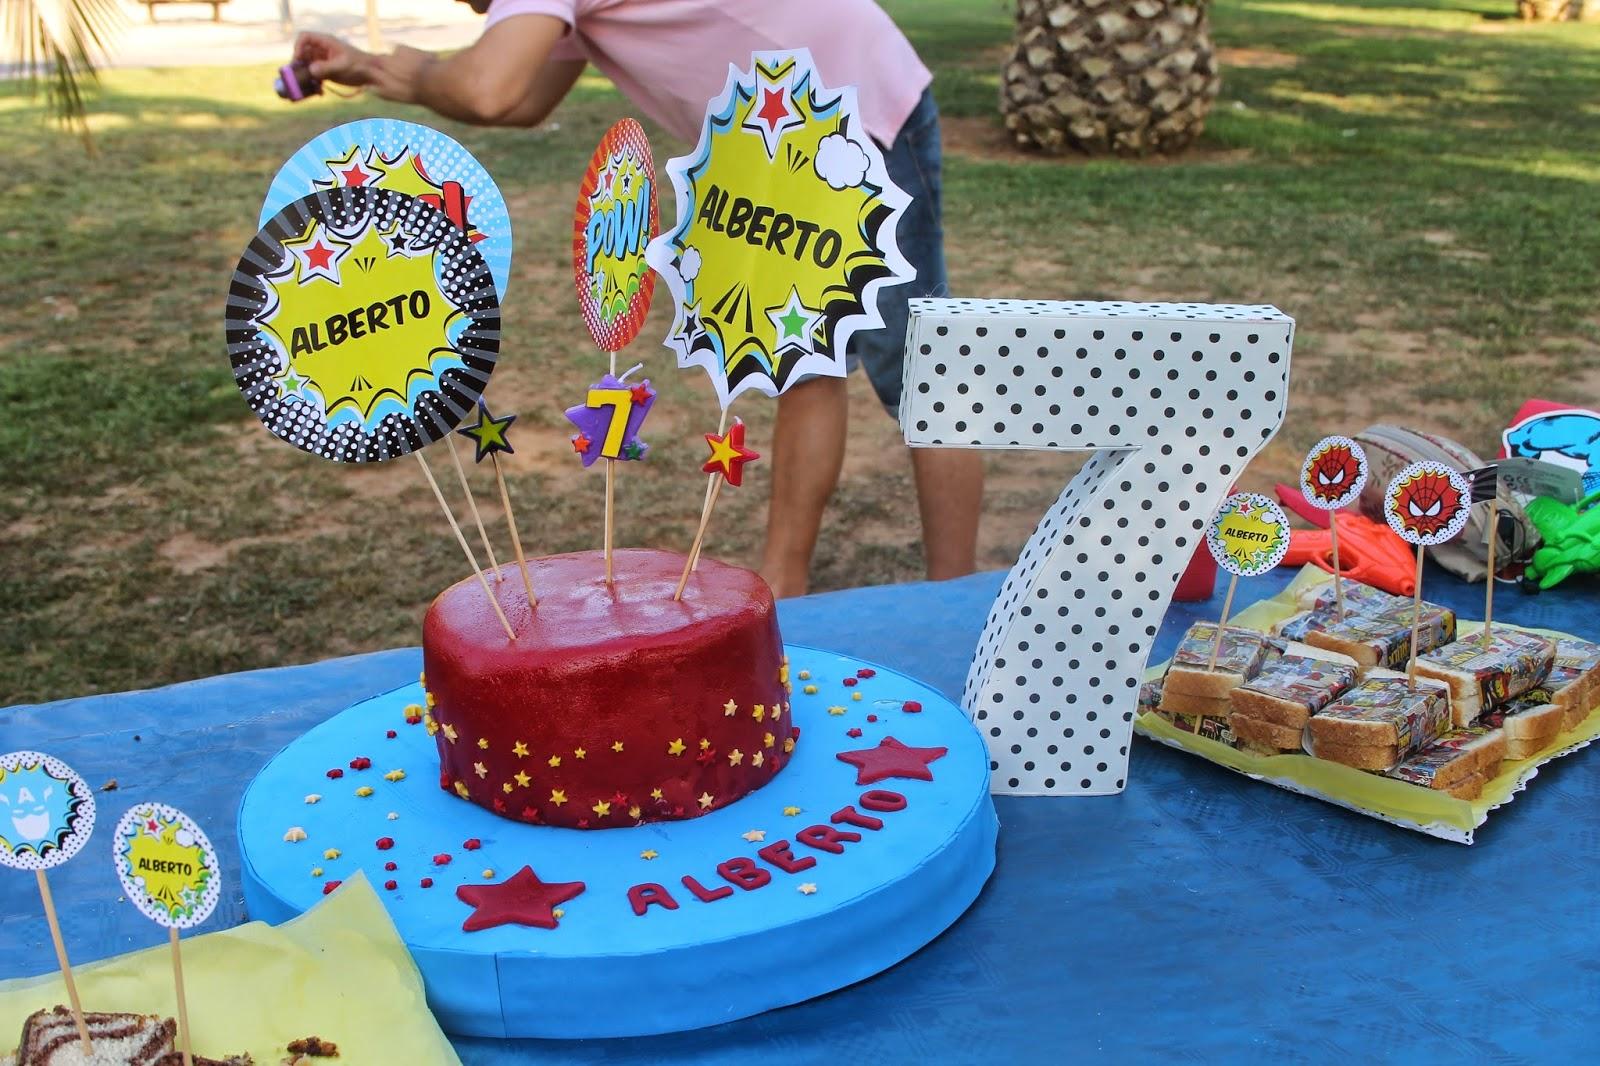 Decoracion cumpleanos infantiles 7 anos - Decoracion cumpleanos nino 6 anos ...